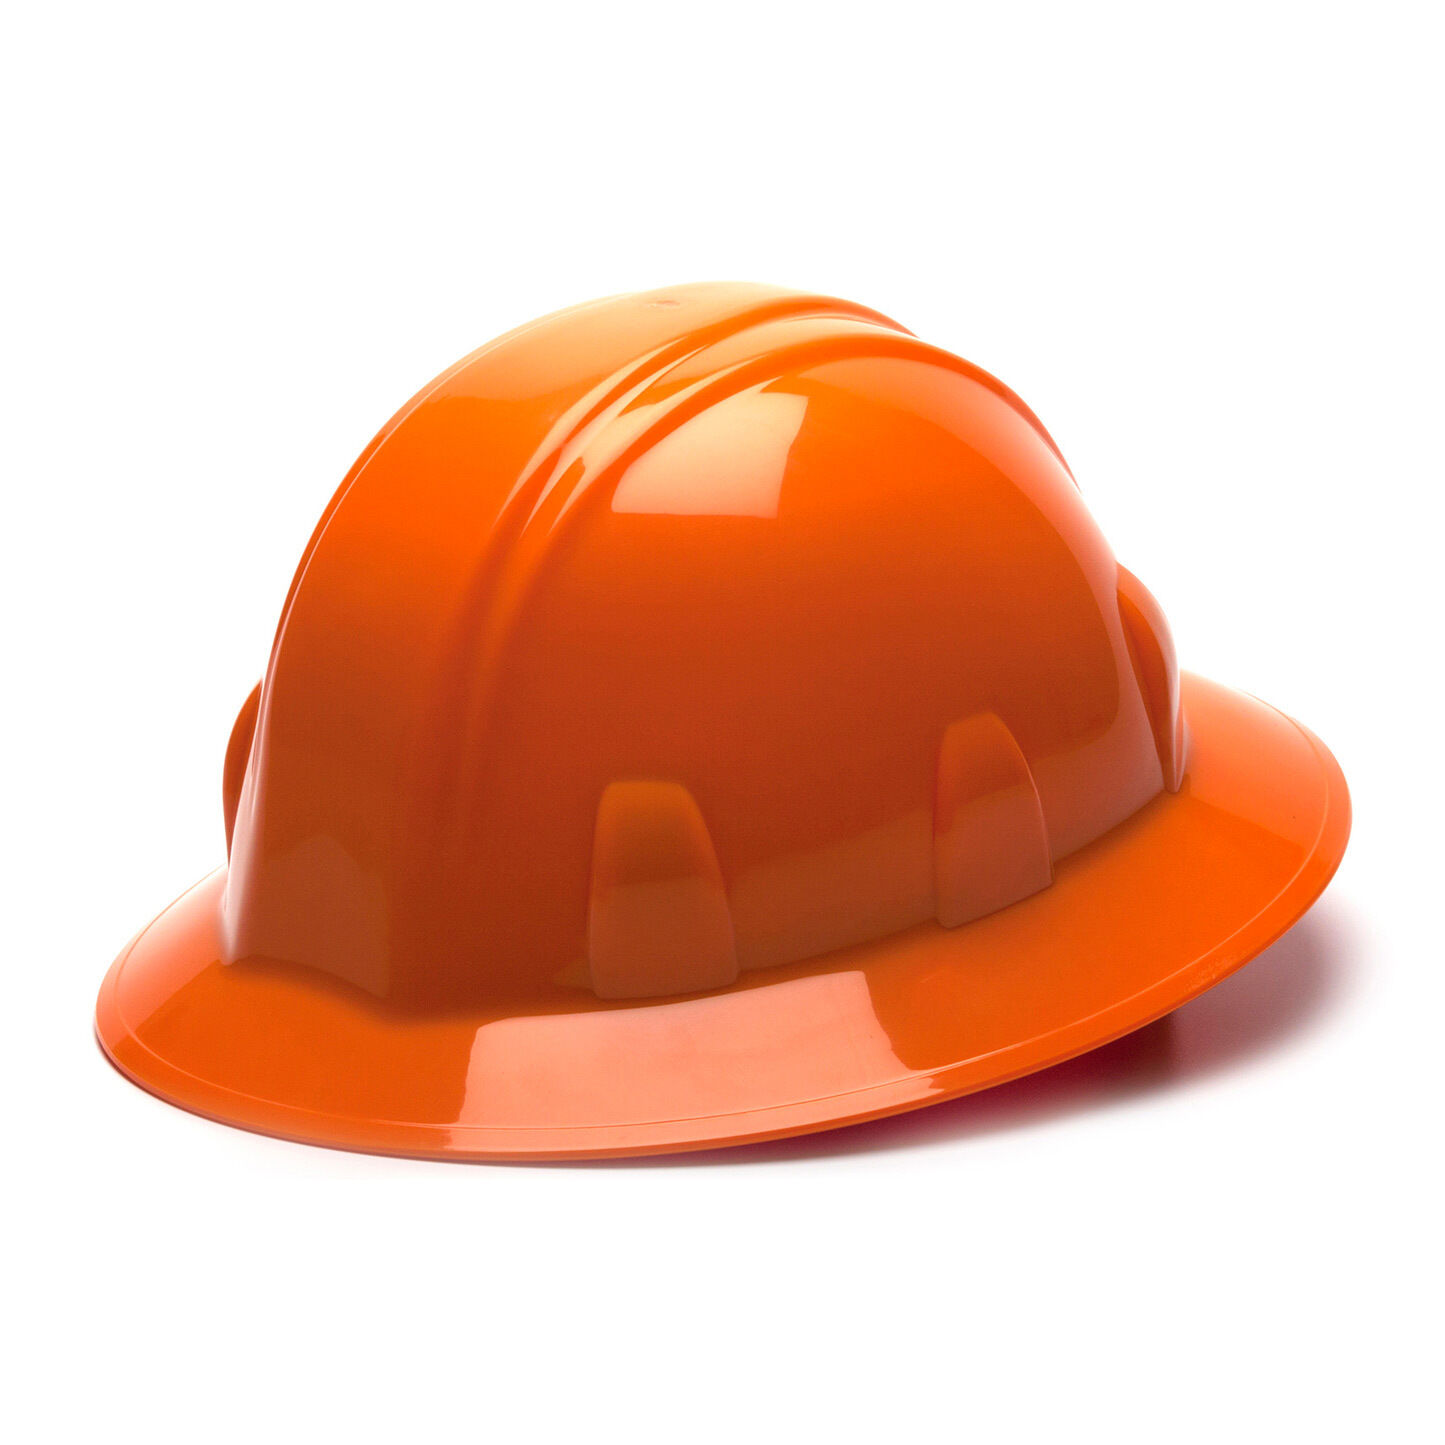 Pyramex Full Brim 4-Pt Ratchet Hard Hat, Orng